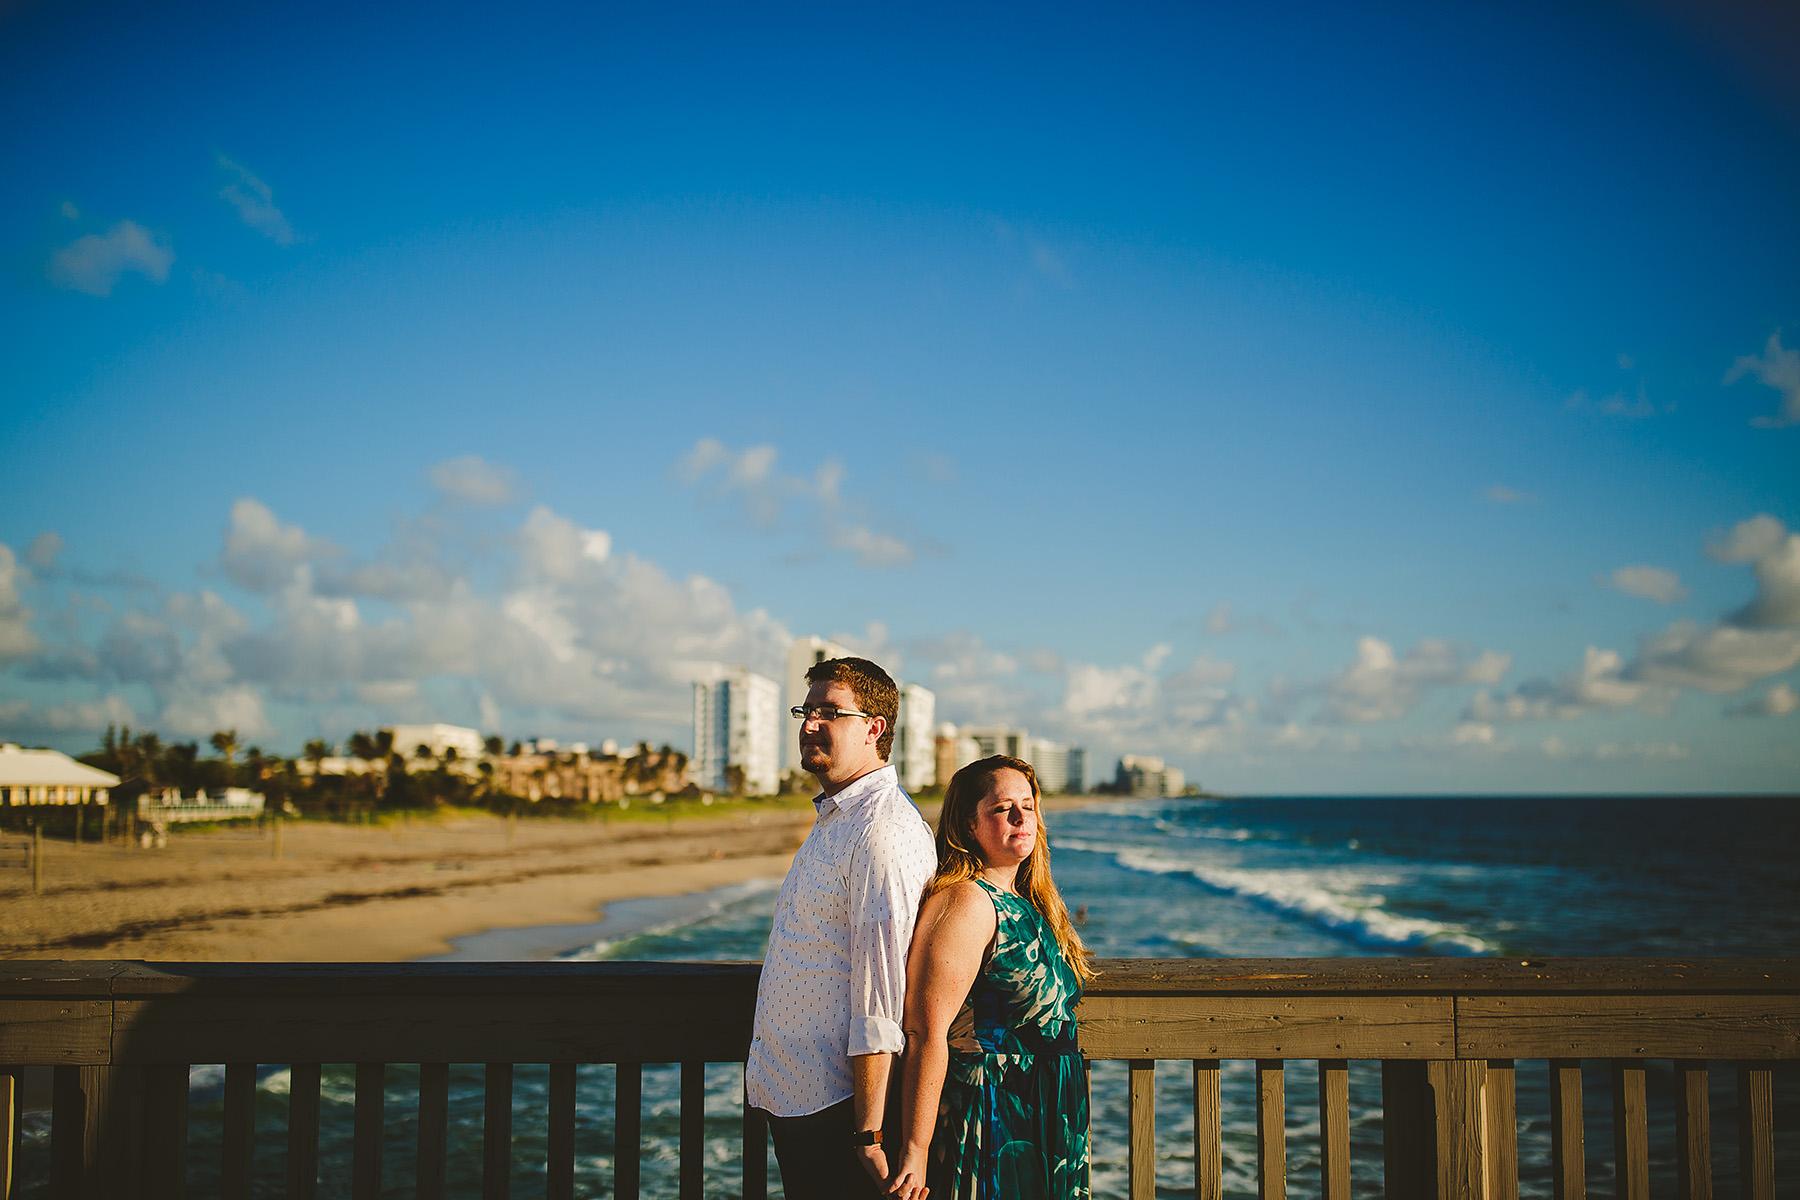 blue-skies-deerfield-beach-engagement-session-tiny-house-photo.jpg